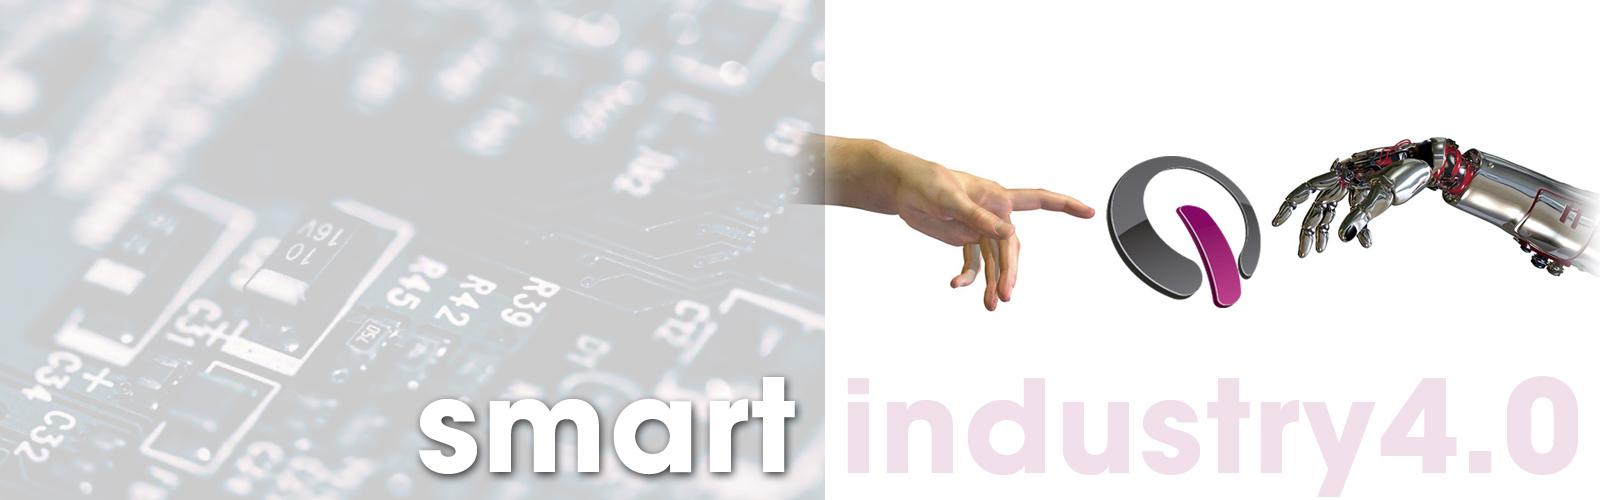 ebi industry 4.0 industria